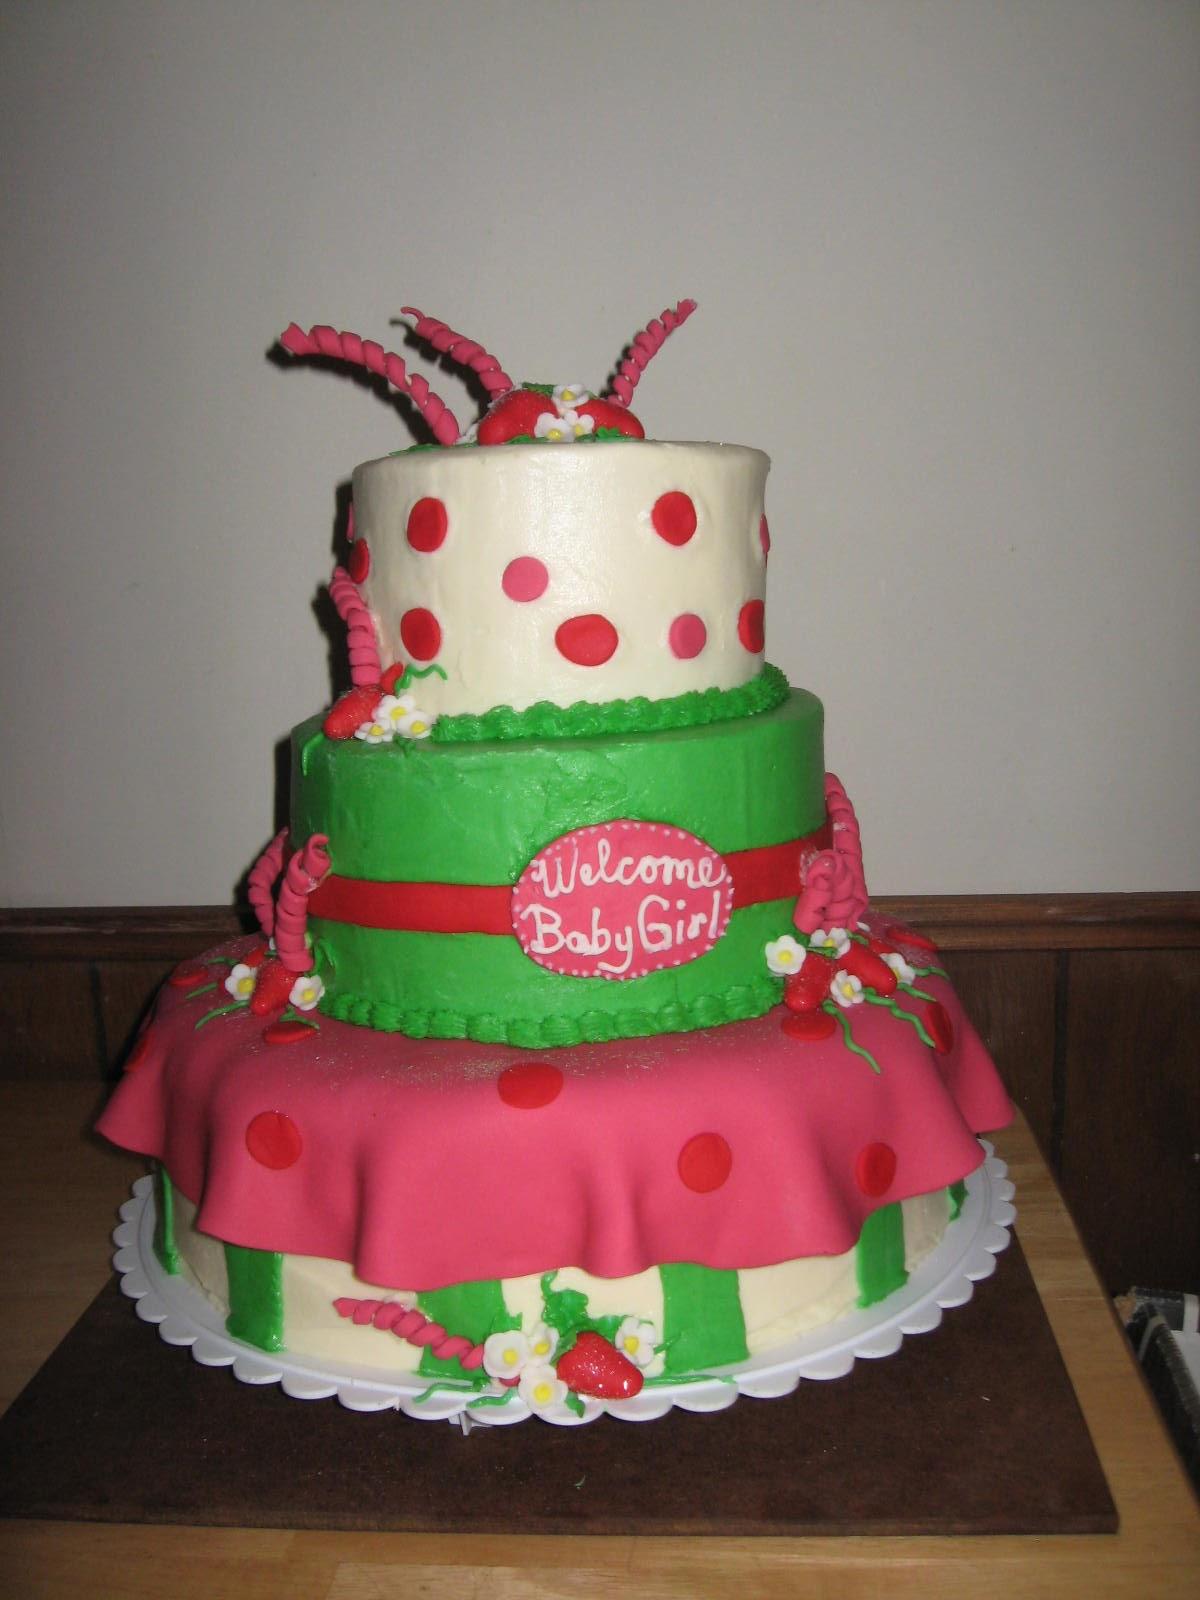 CAKES BY BRENDA Great Falls Montana Strawberry shortcake